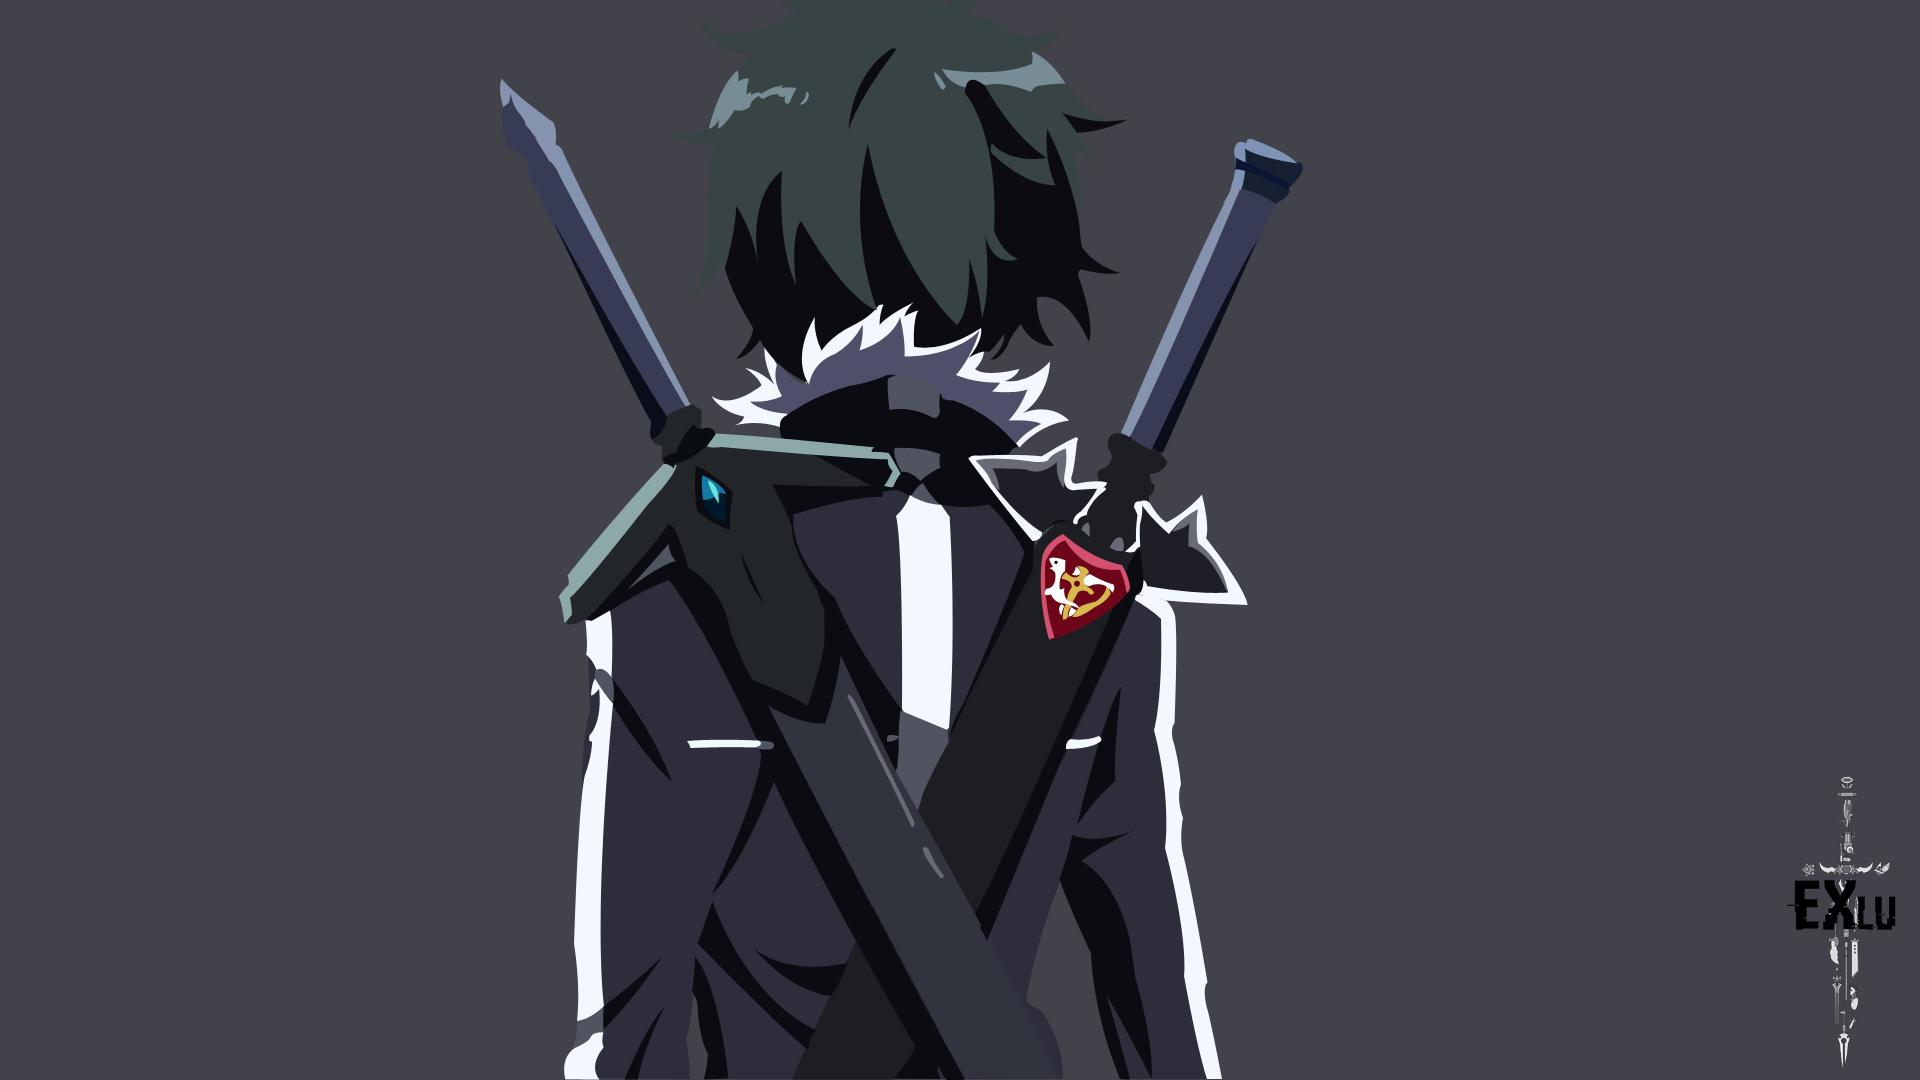 sword art online full hd wallpaper and background